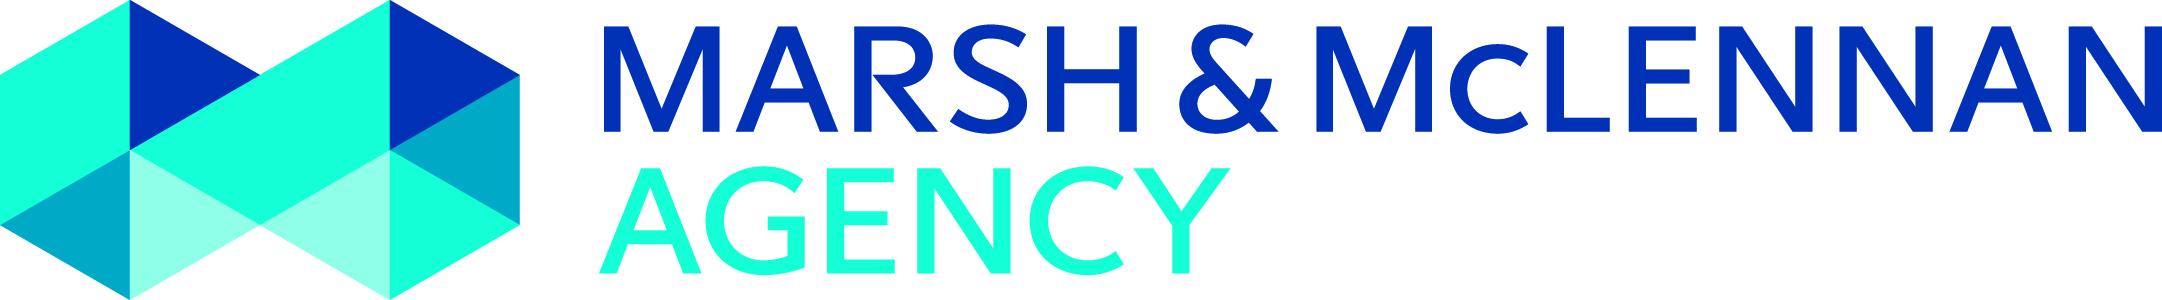 01 Marsh and McLennan Logo.jpg